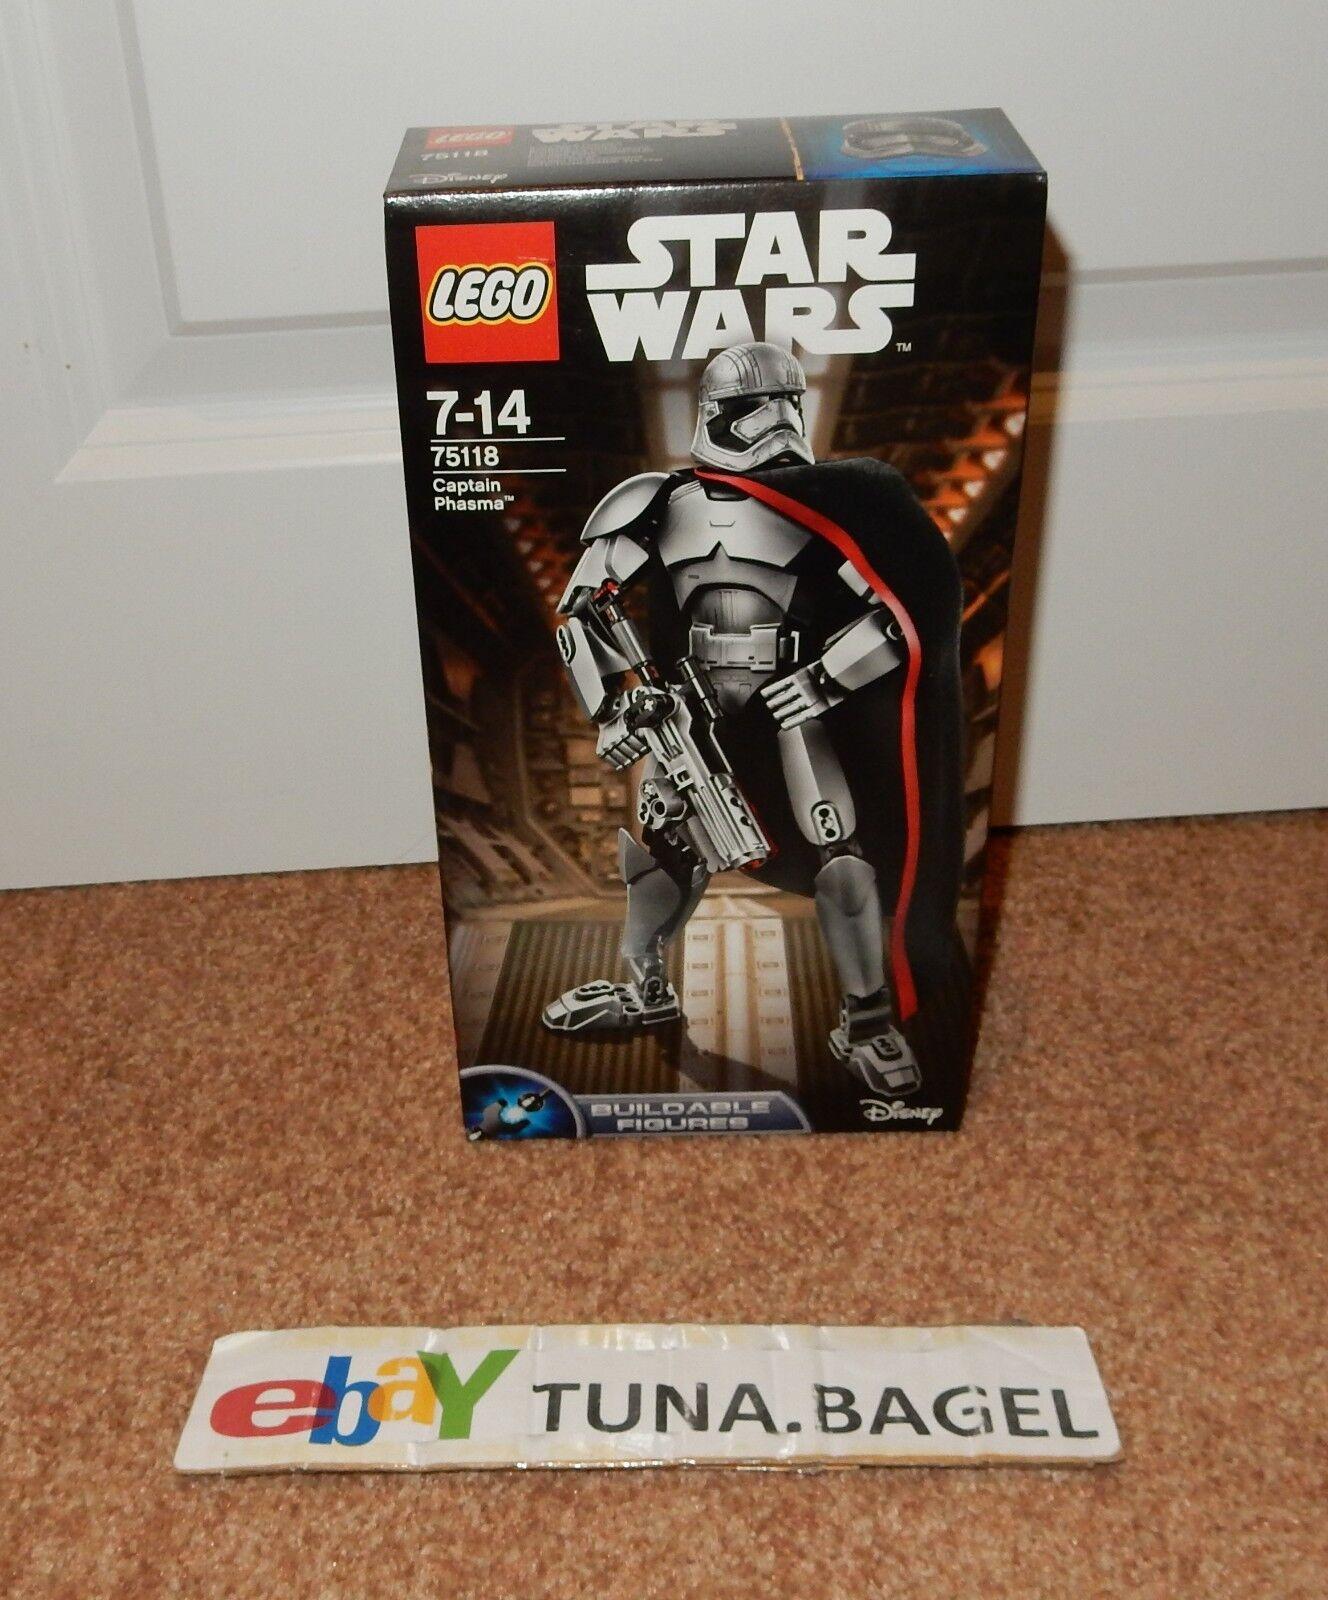 Lego Star Wars Captain Phasma (75118)